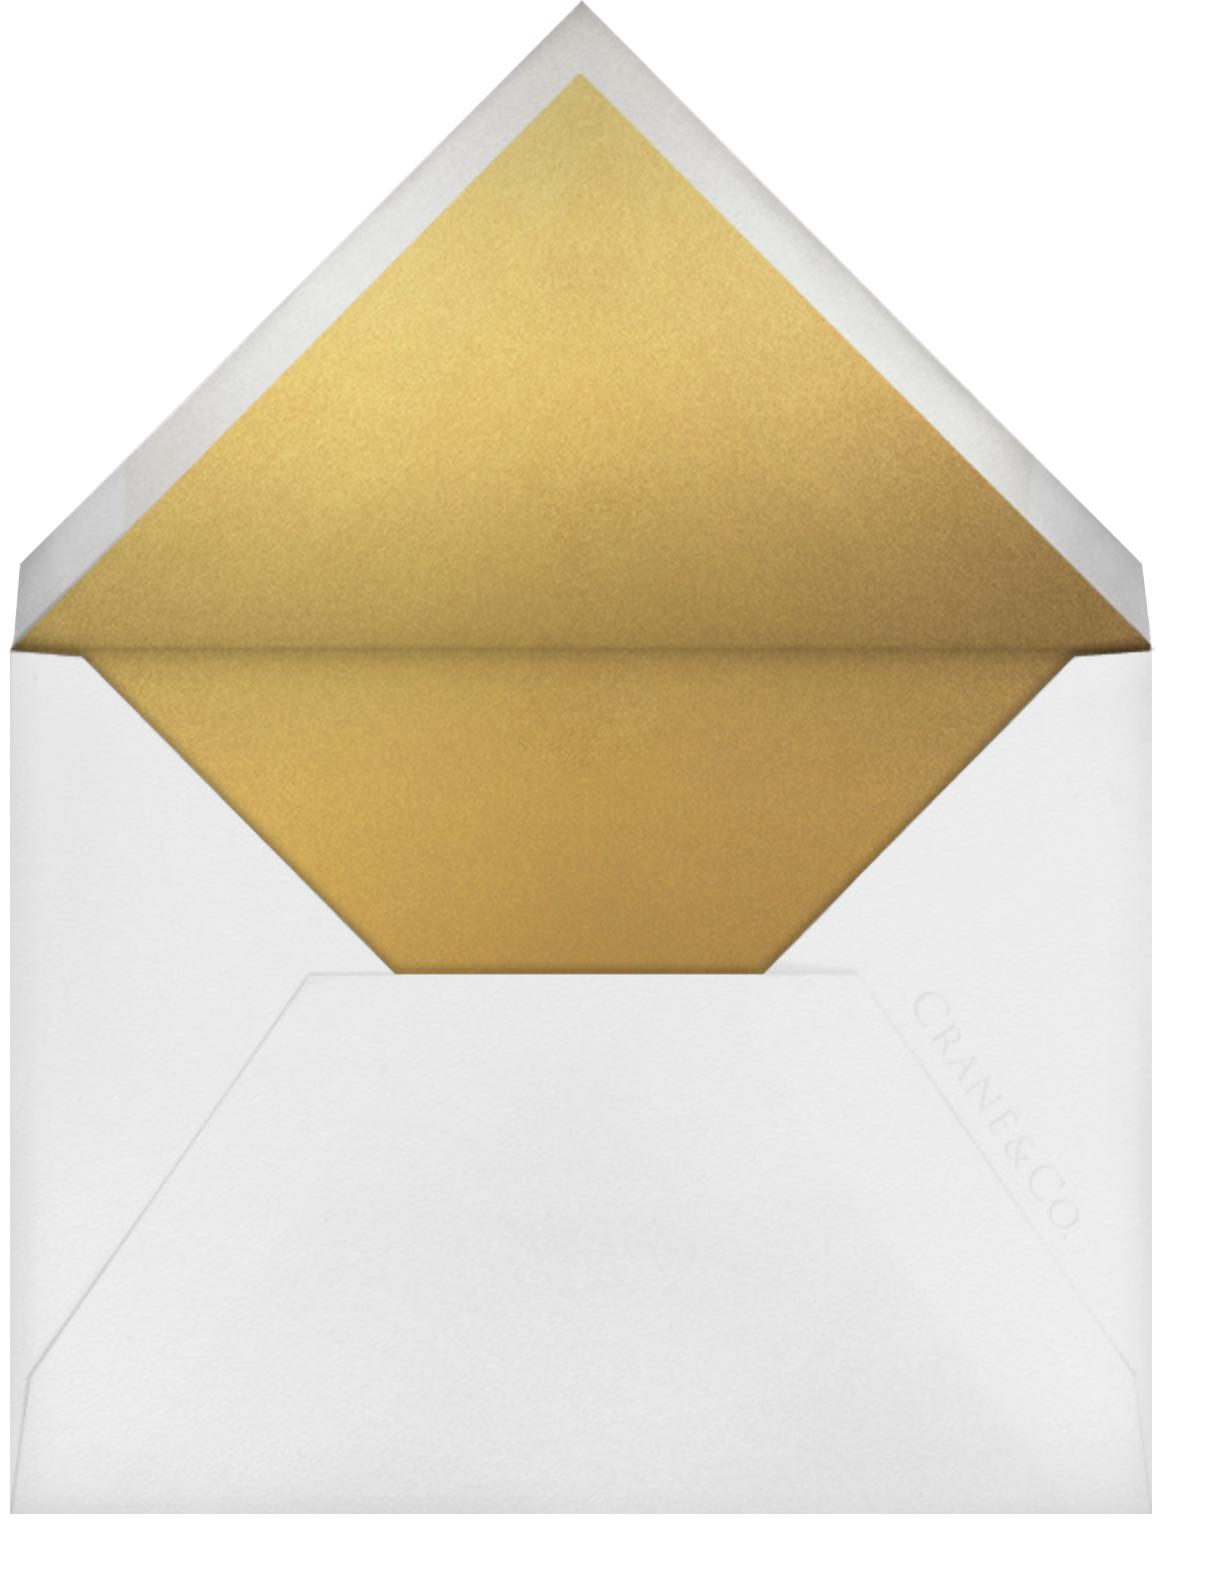 Falling Poppies I (Stationery) - Oscar de la Renta - Personalized stationery - envelope back